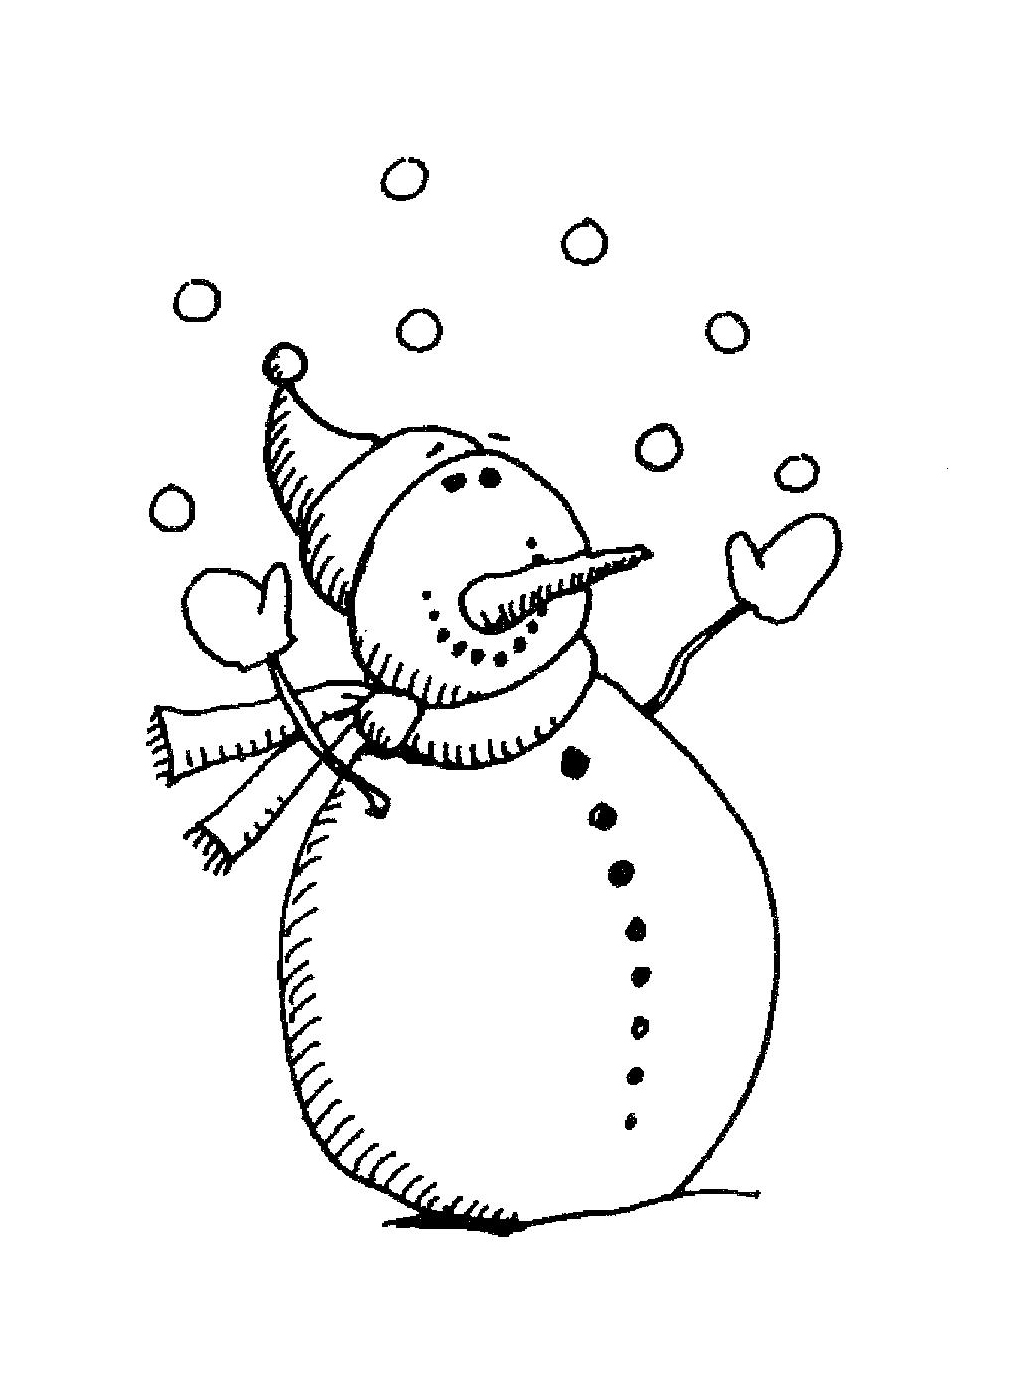 1020x1378 Snowman Drawings D.i.y. Snowman